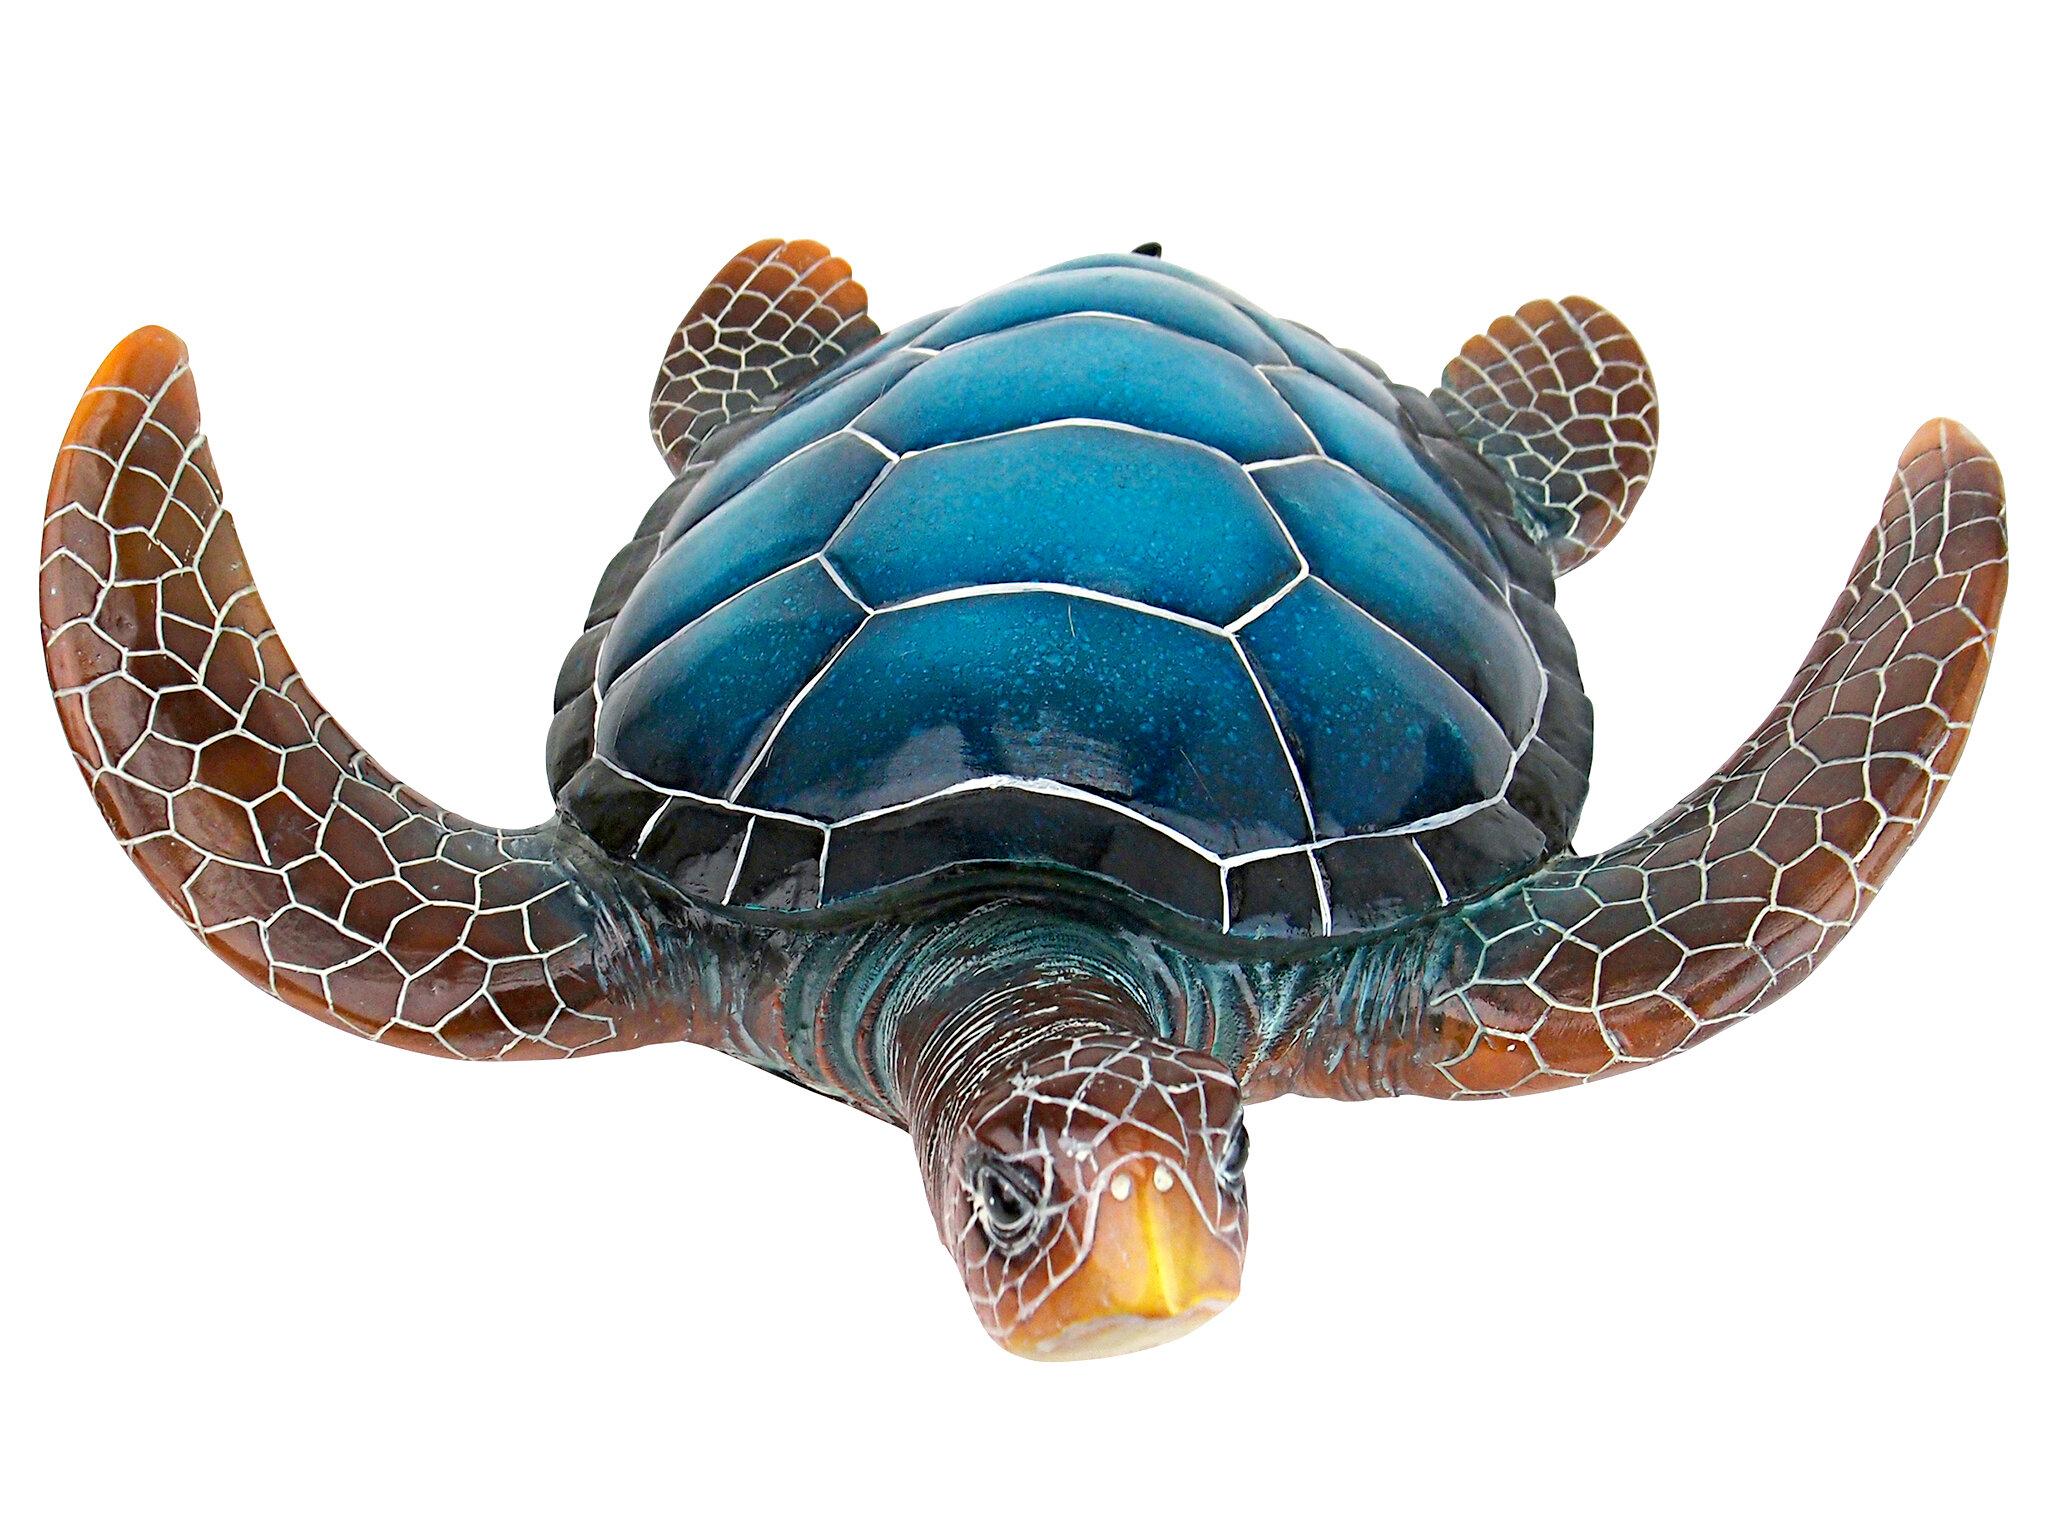 Turtle sea ocean outdoor wild Mailbox topper statue